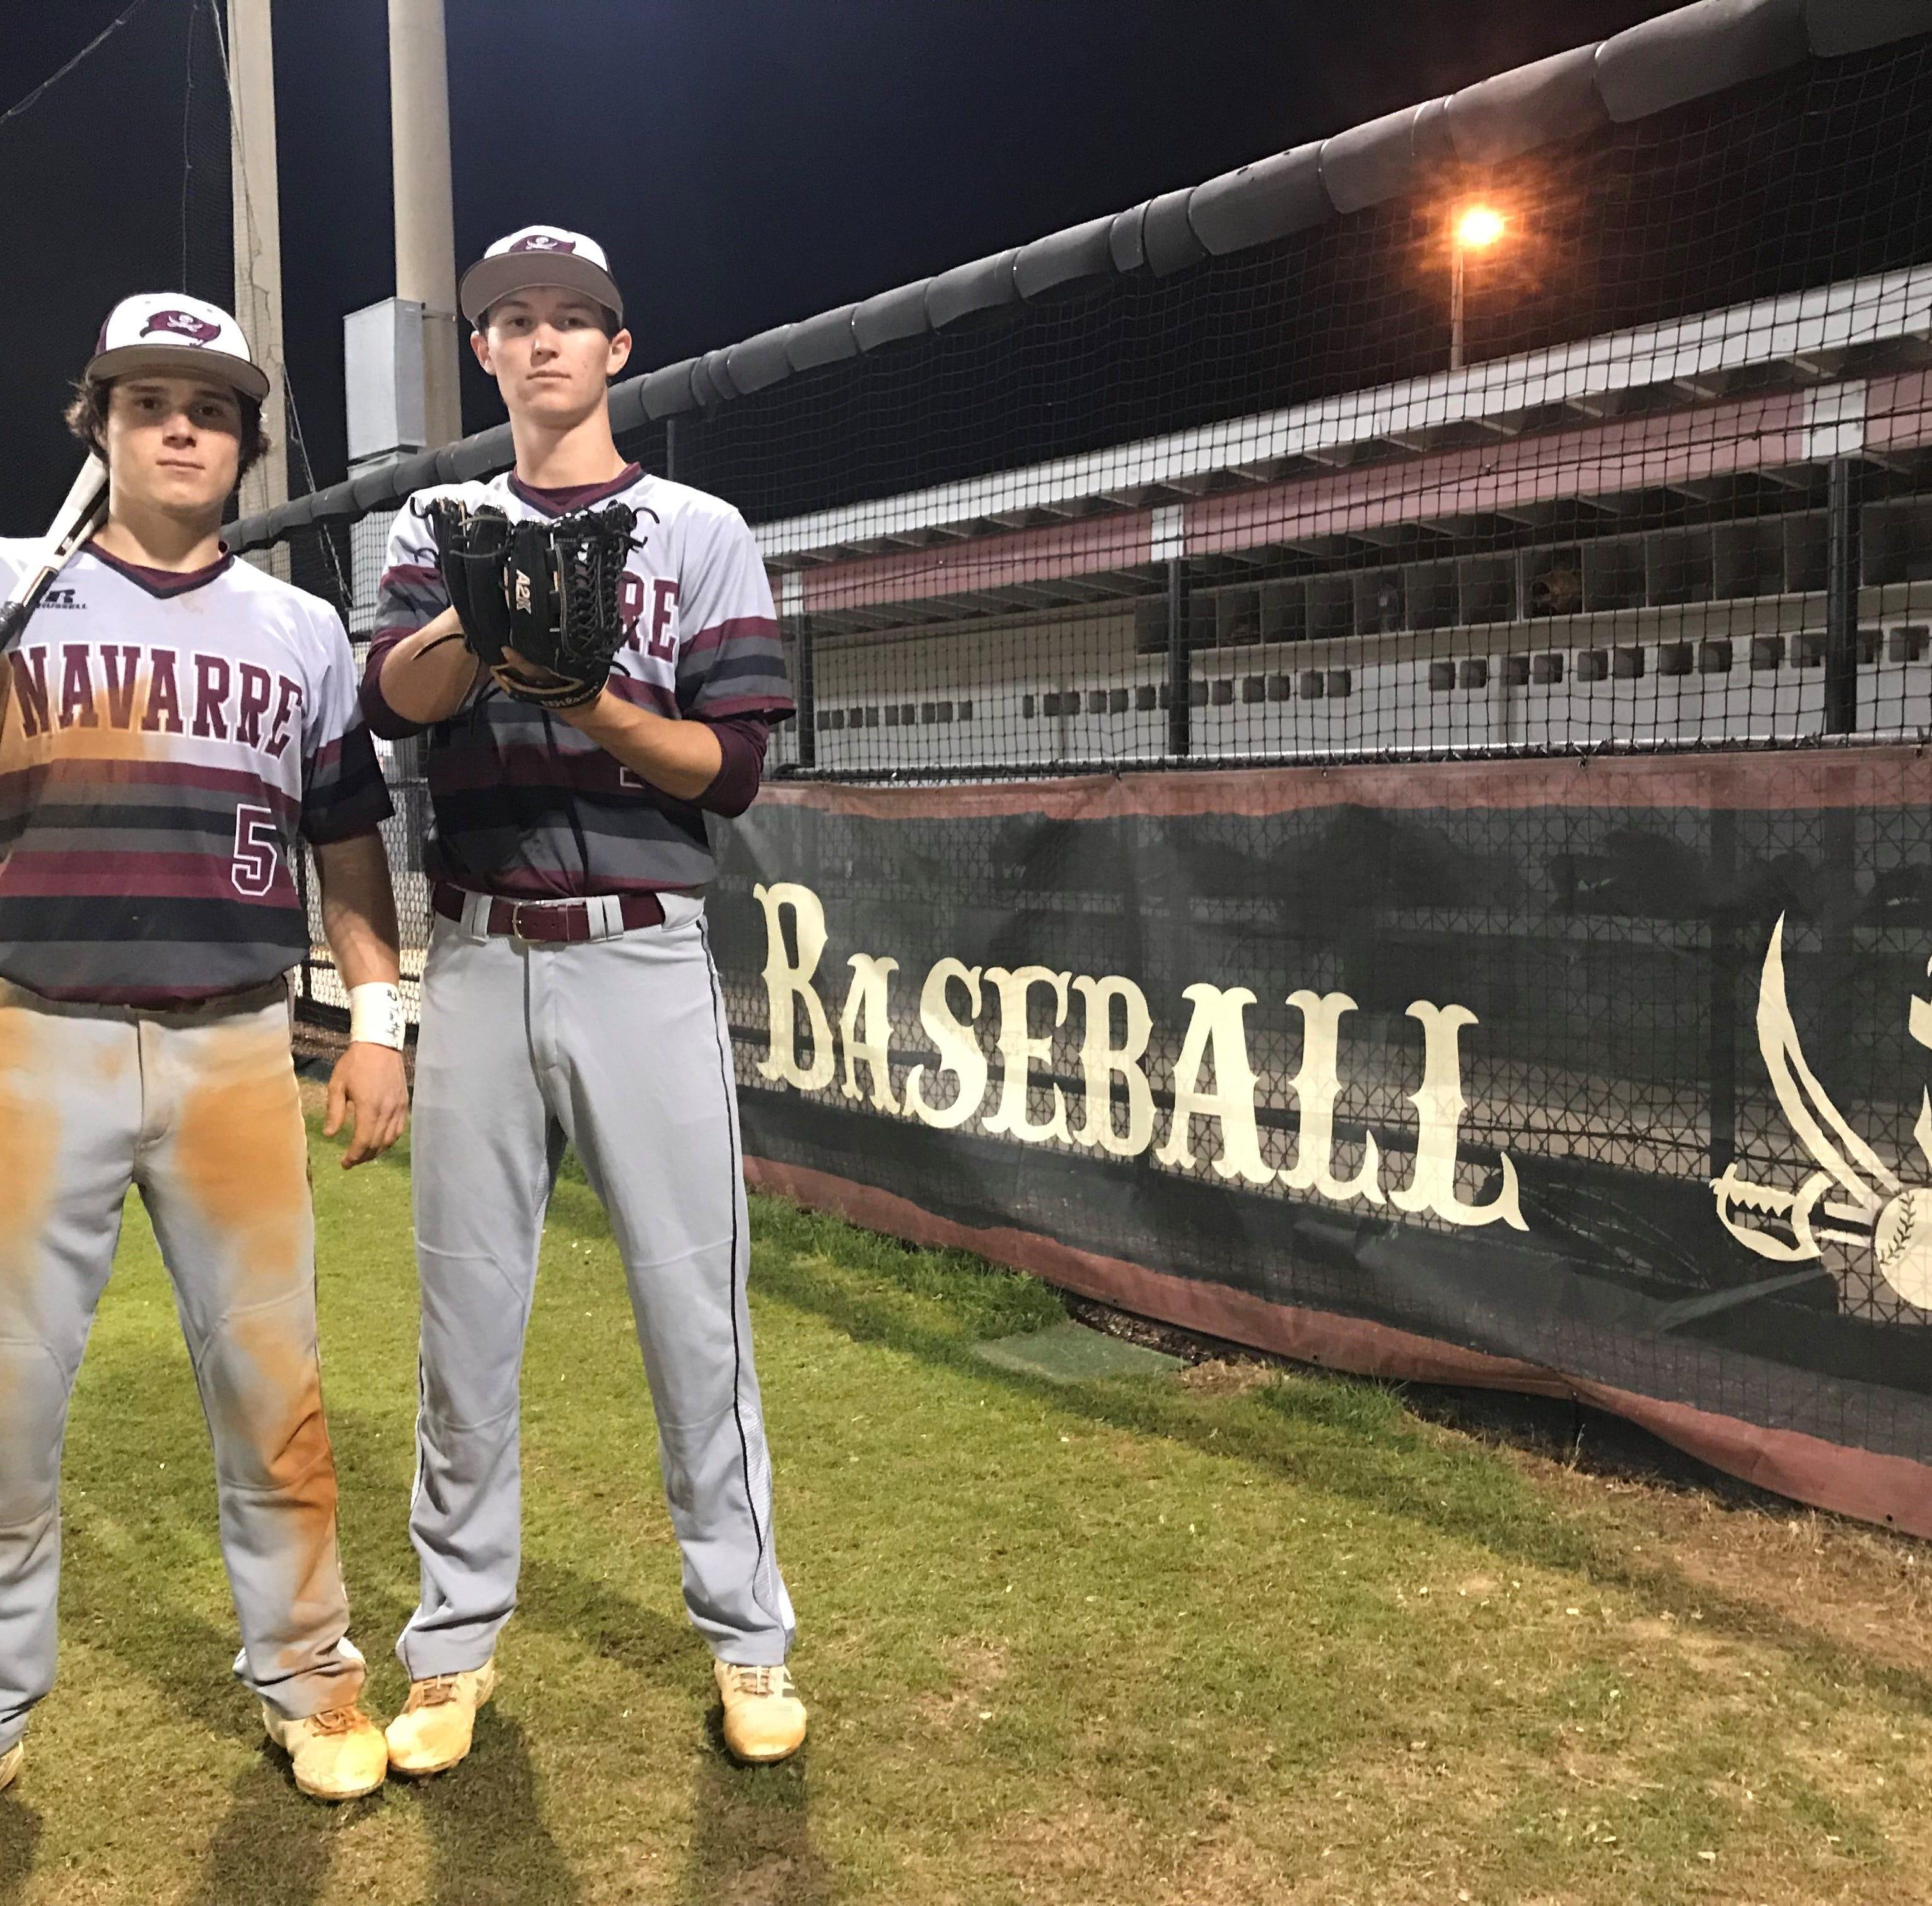 Navarre seniors Ackman, Terrian aim for steady improvement for baseball team